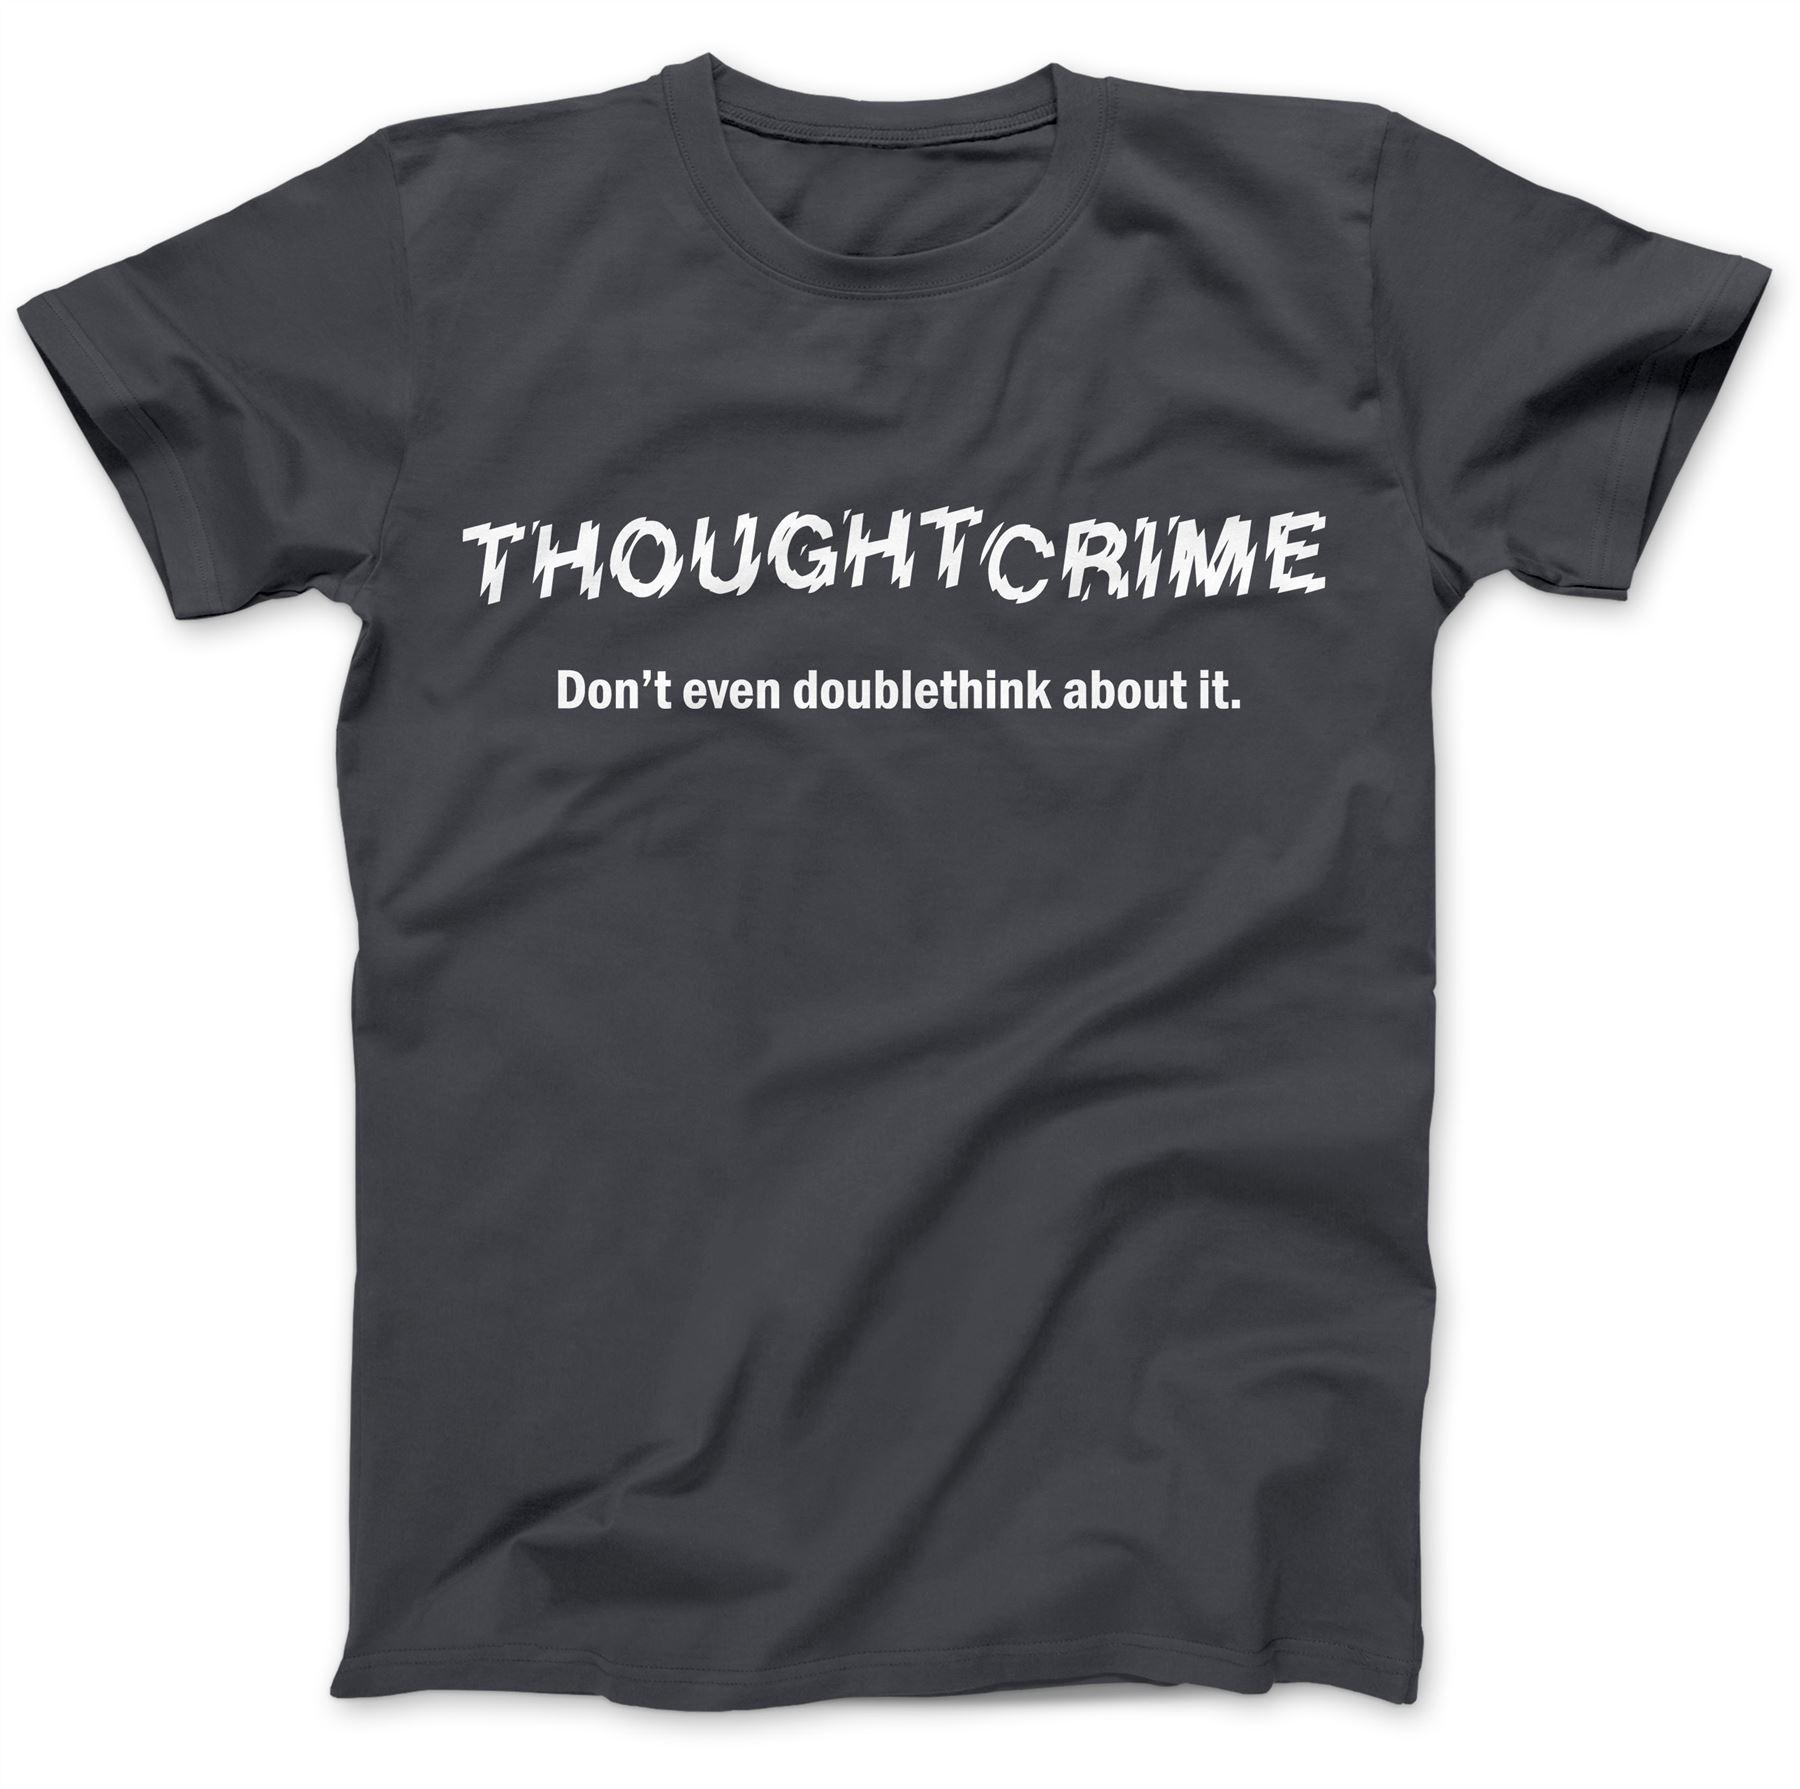 1984-Thought-Crime-George-Orwell-T-Shirt-100-Premium-Cotton-Animal-Farm miniatuur 13